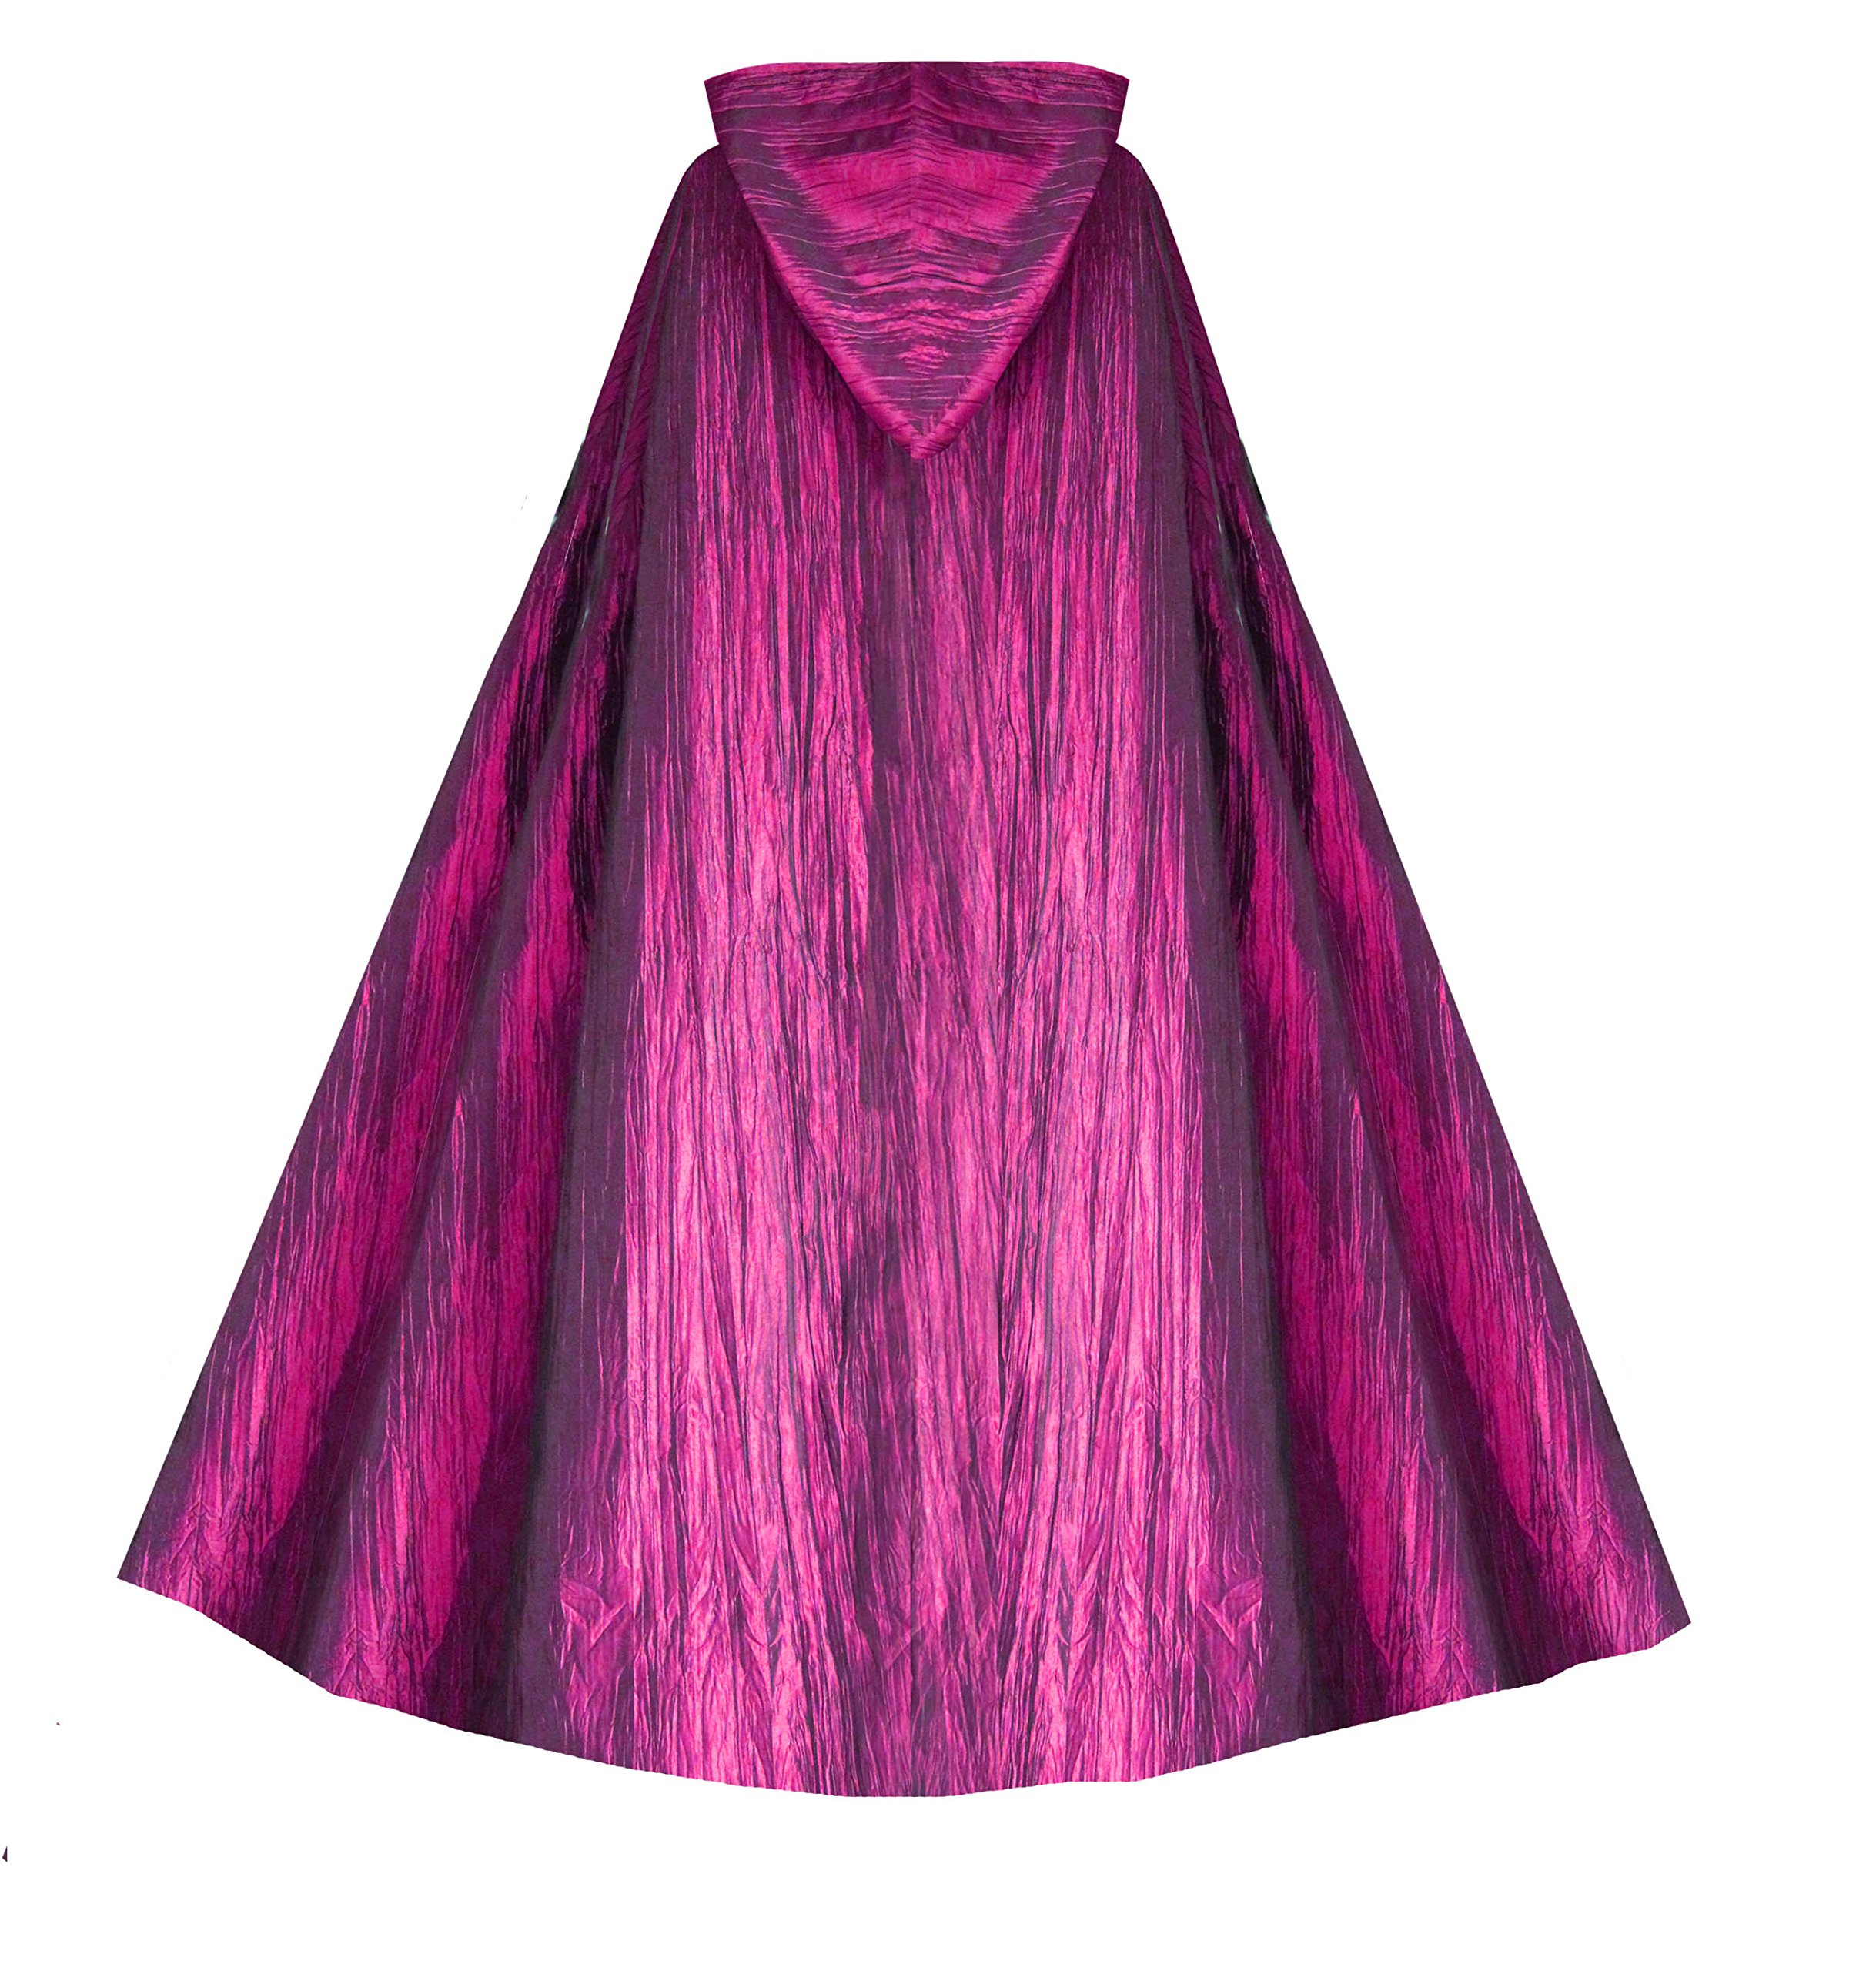 Cykxtees Historical Gothic Steampunk Victorian Hooded Renaissance Short Capelet Cloak 4